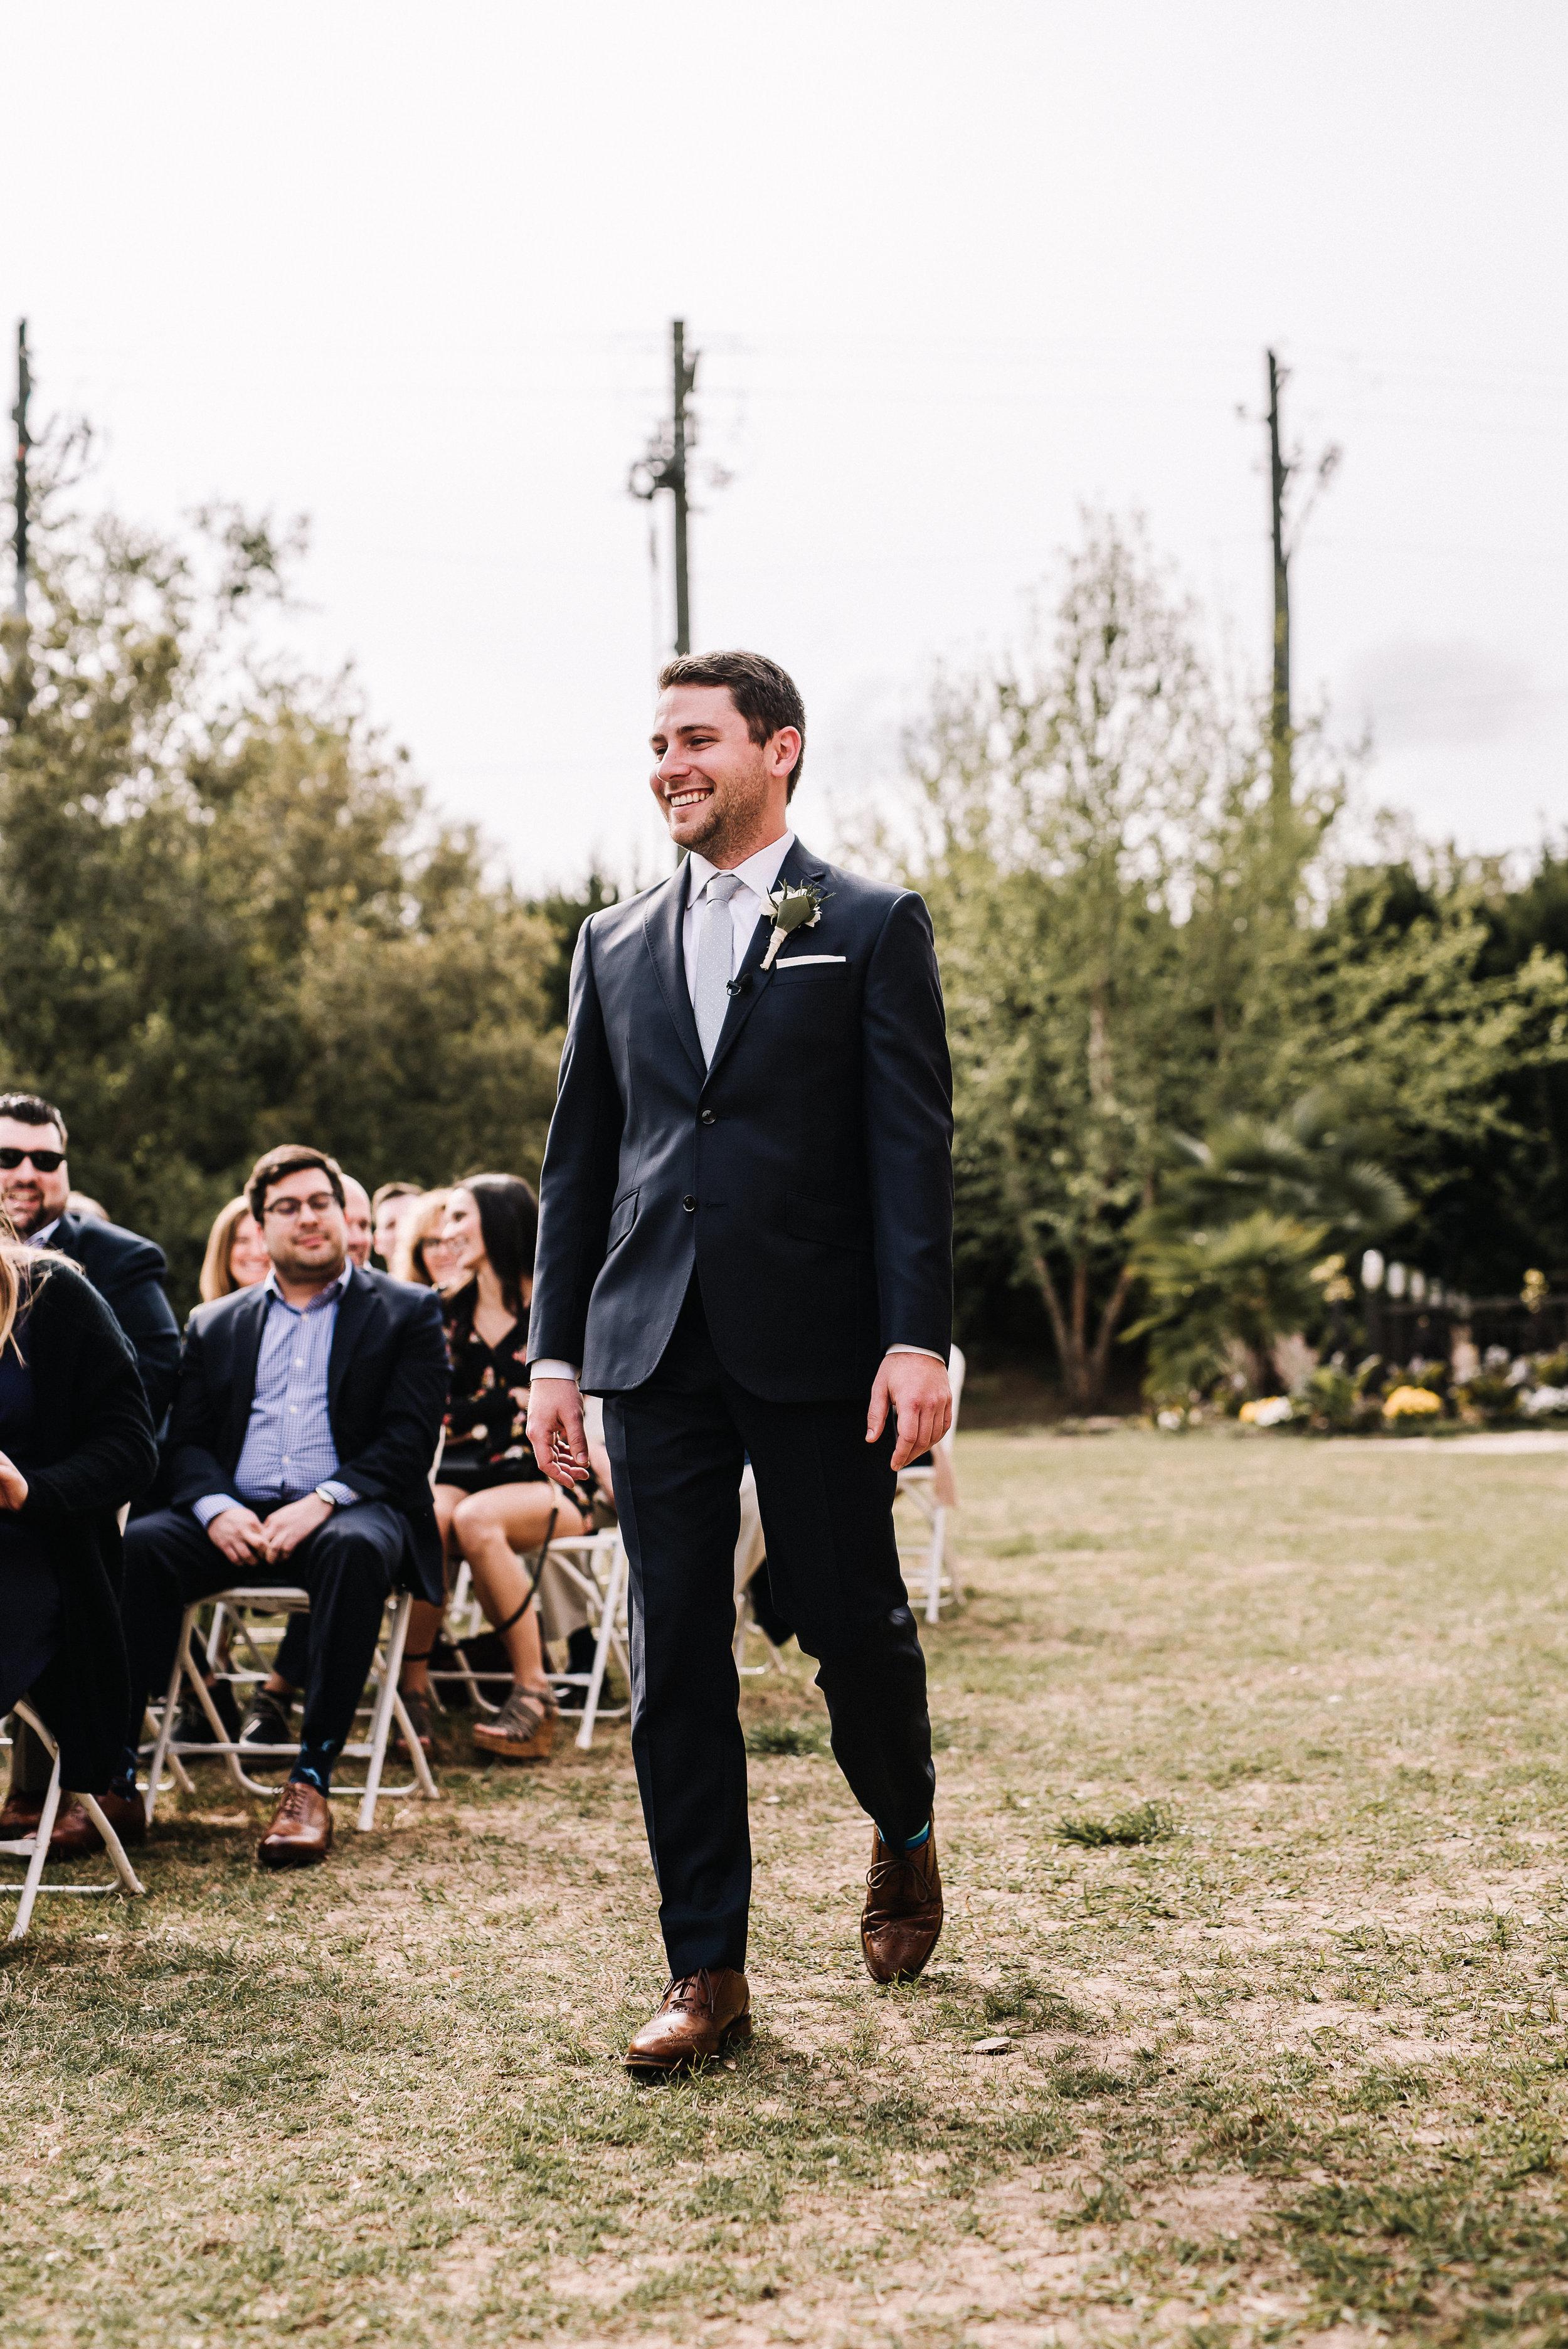 Morgan Wedding_Mill at Yellow River_Ashley Benham Photography-507.jpg